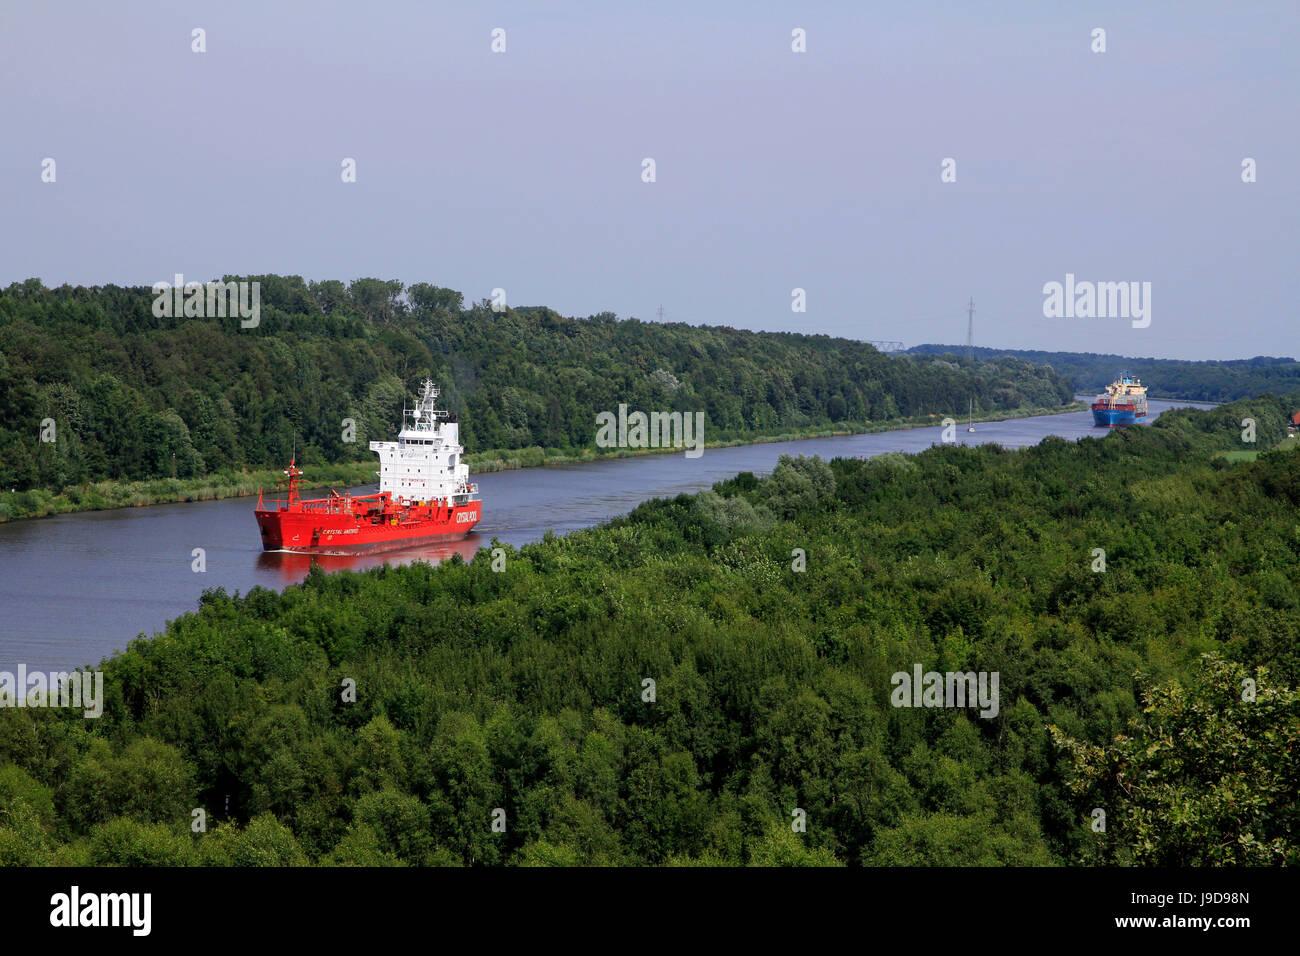 Freight Ships on Kiel Canal going near Hochdonn, Dithmarschen, Schleswig-Holstein, Germany, Europe - Stock Image